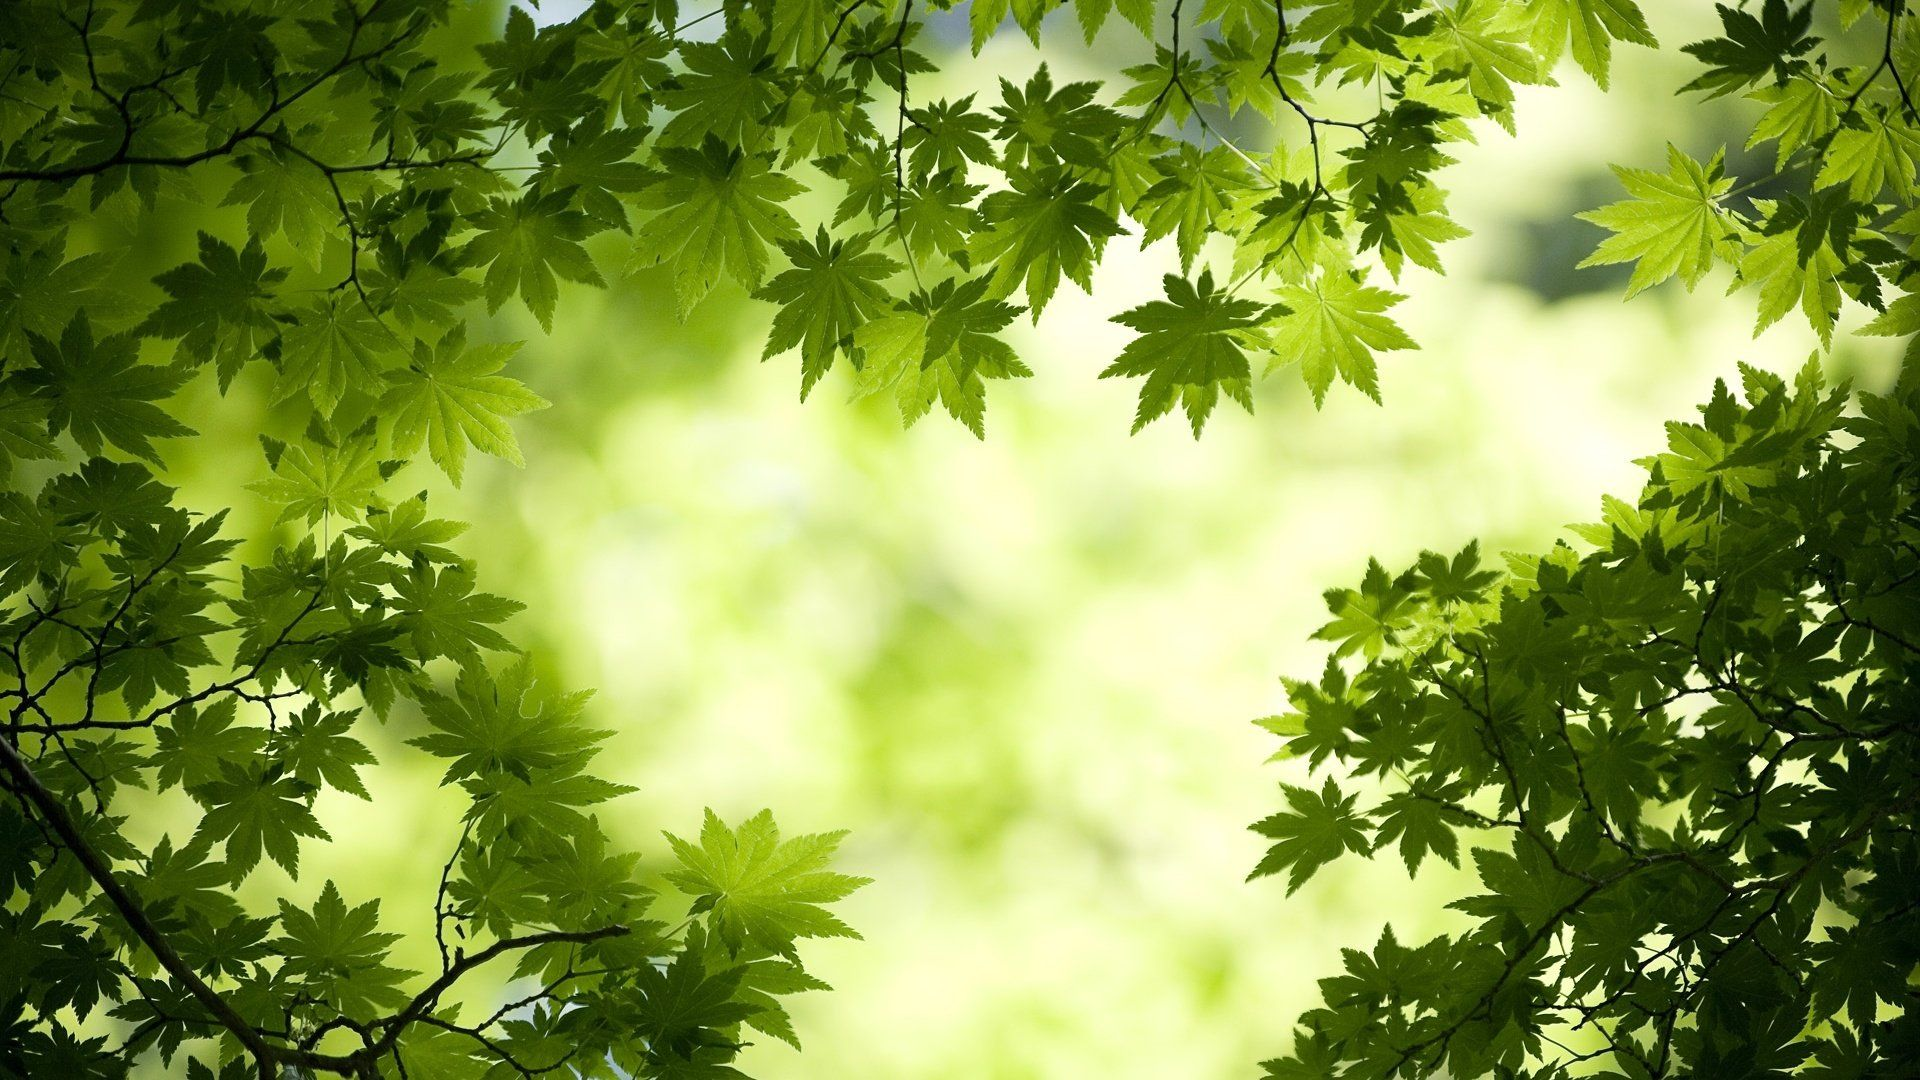 Foliage 1920x1080 wallpaper